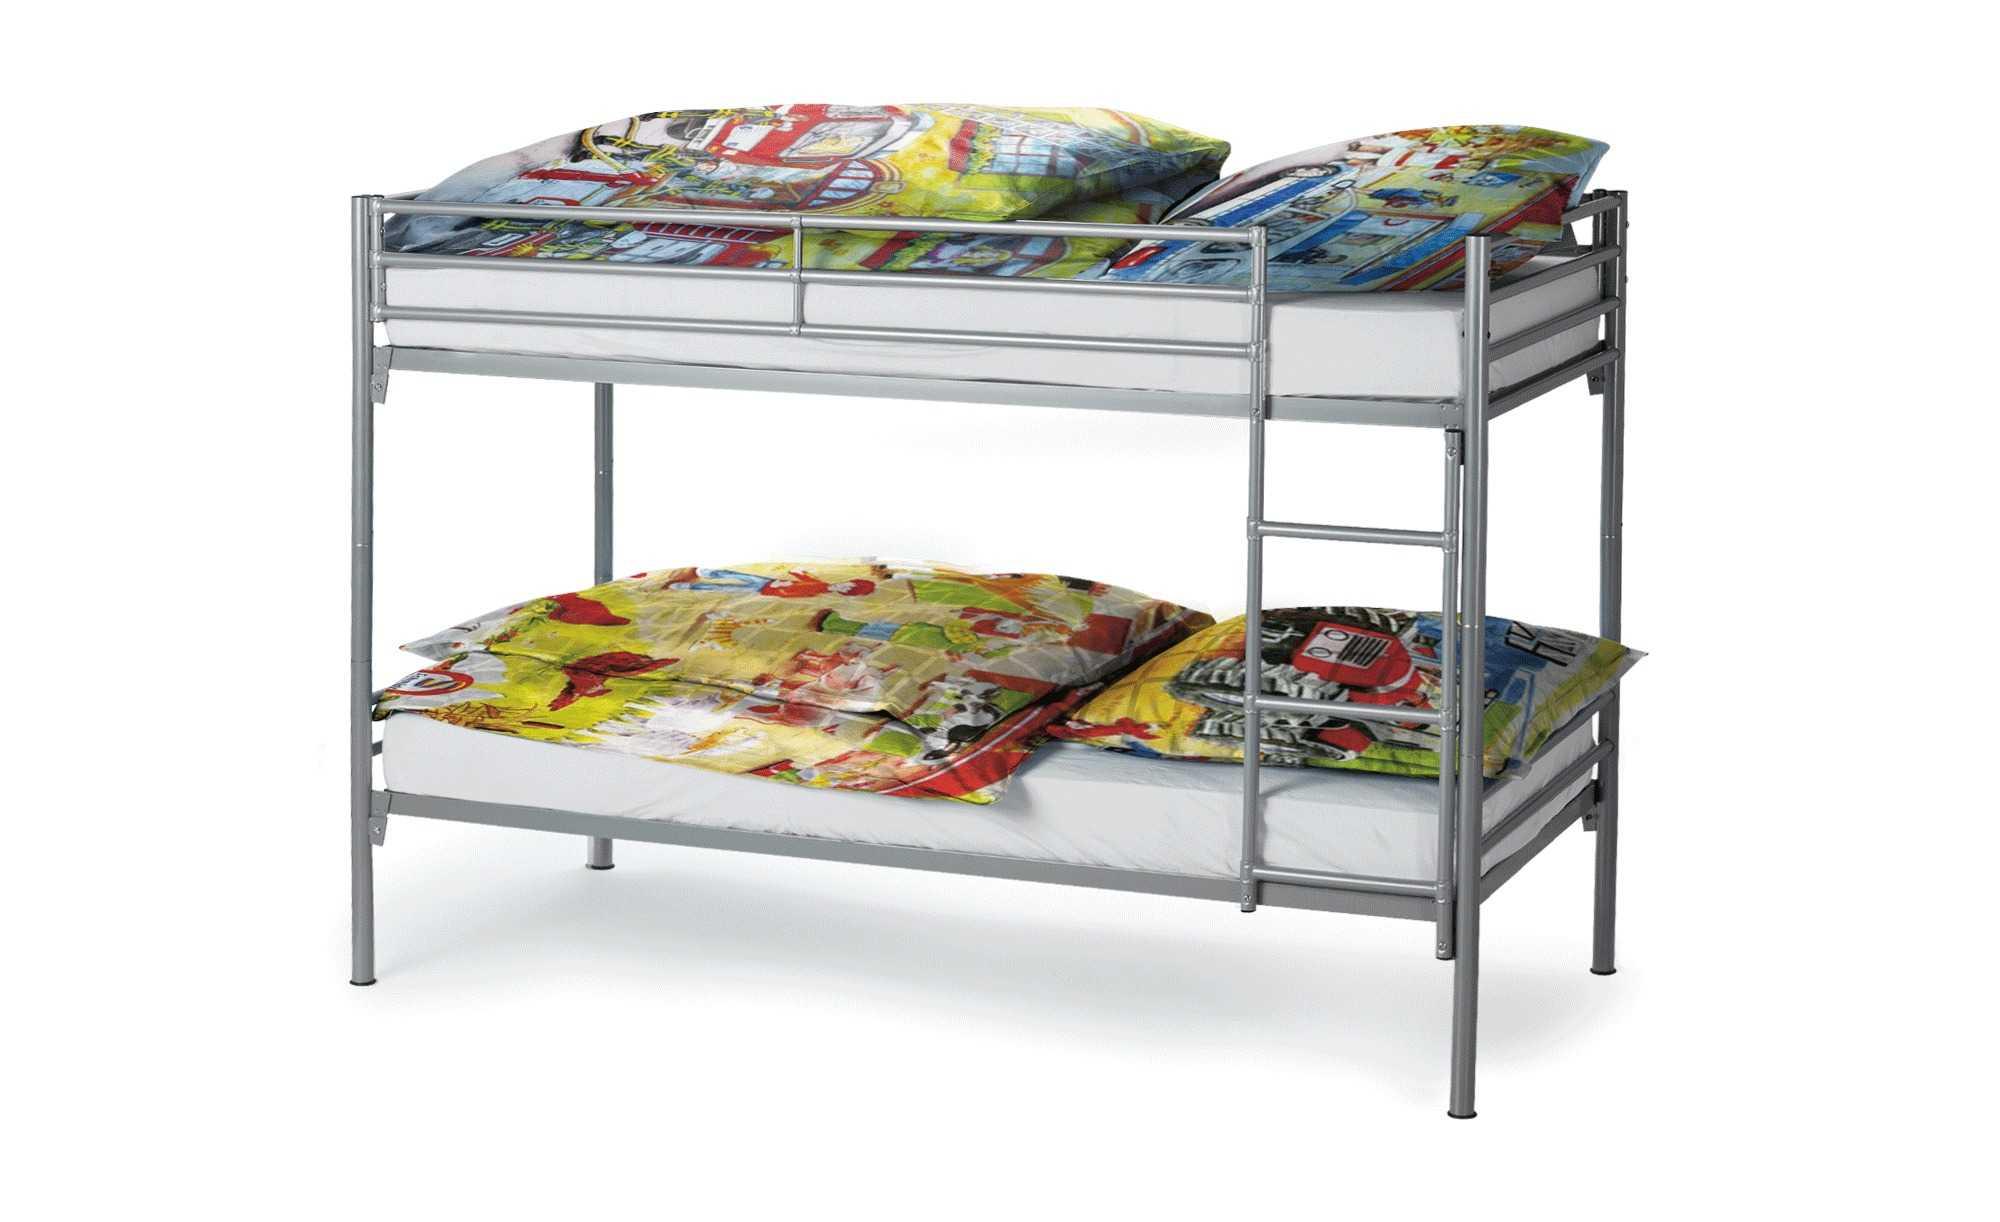 etagenbett aus metall f r 39 bei sconto offline. Black Bedroom Furniture Sets. Home Design Ideas